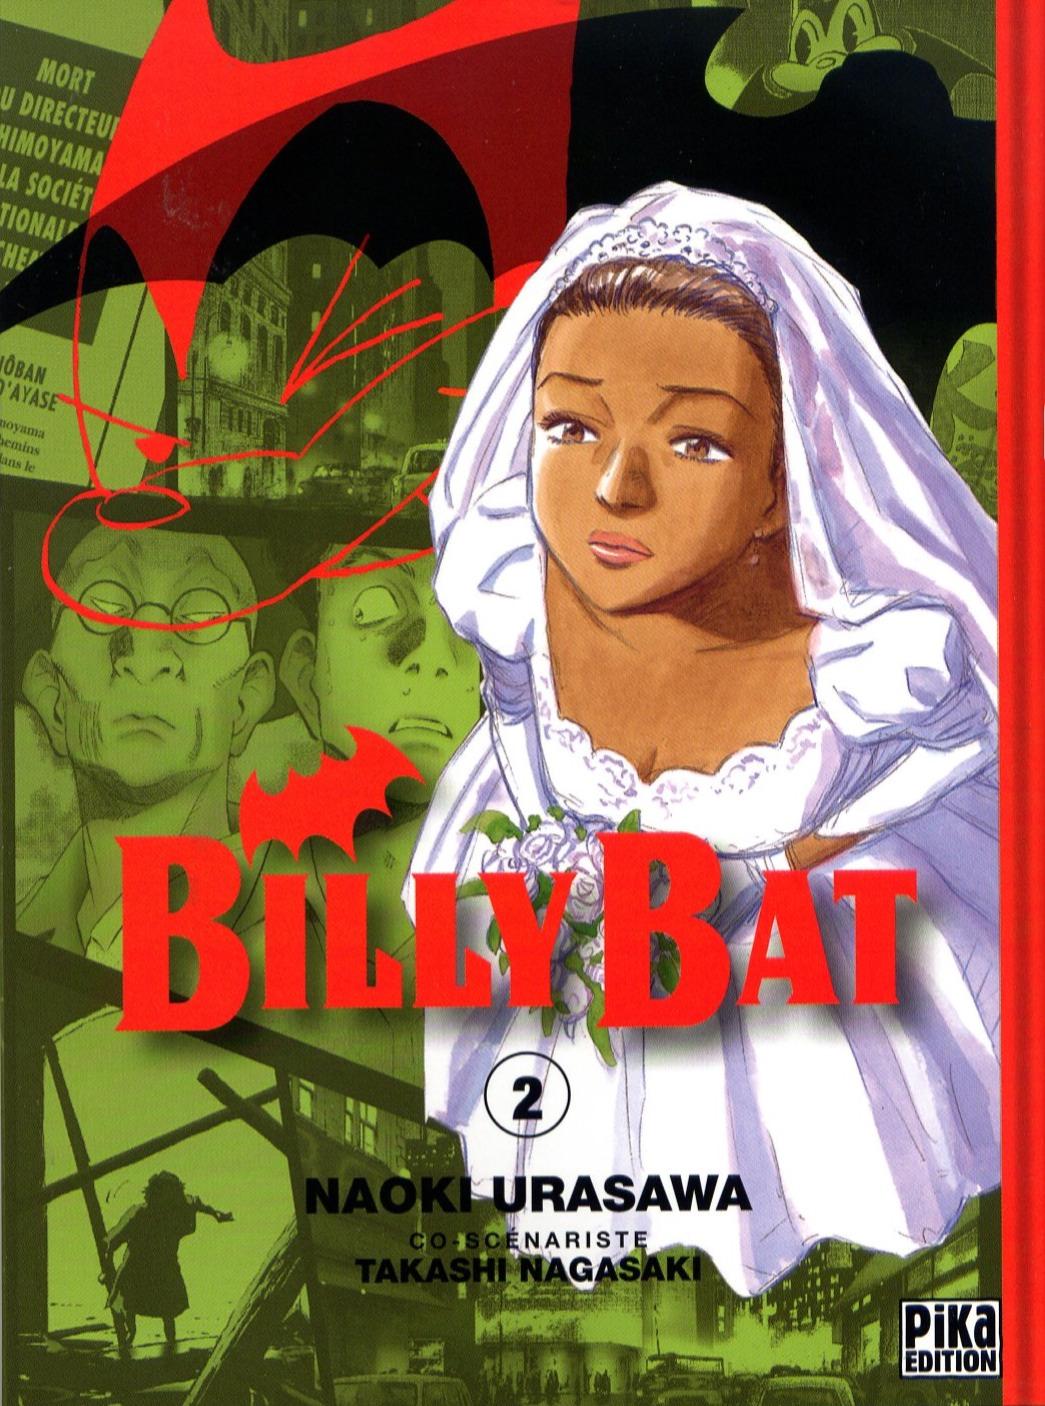 Billy Bat 2